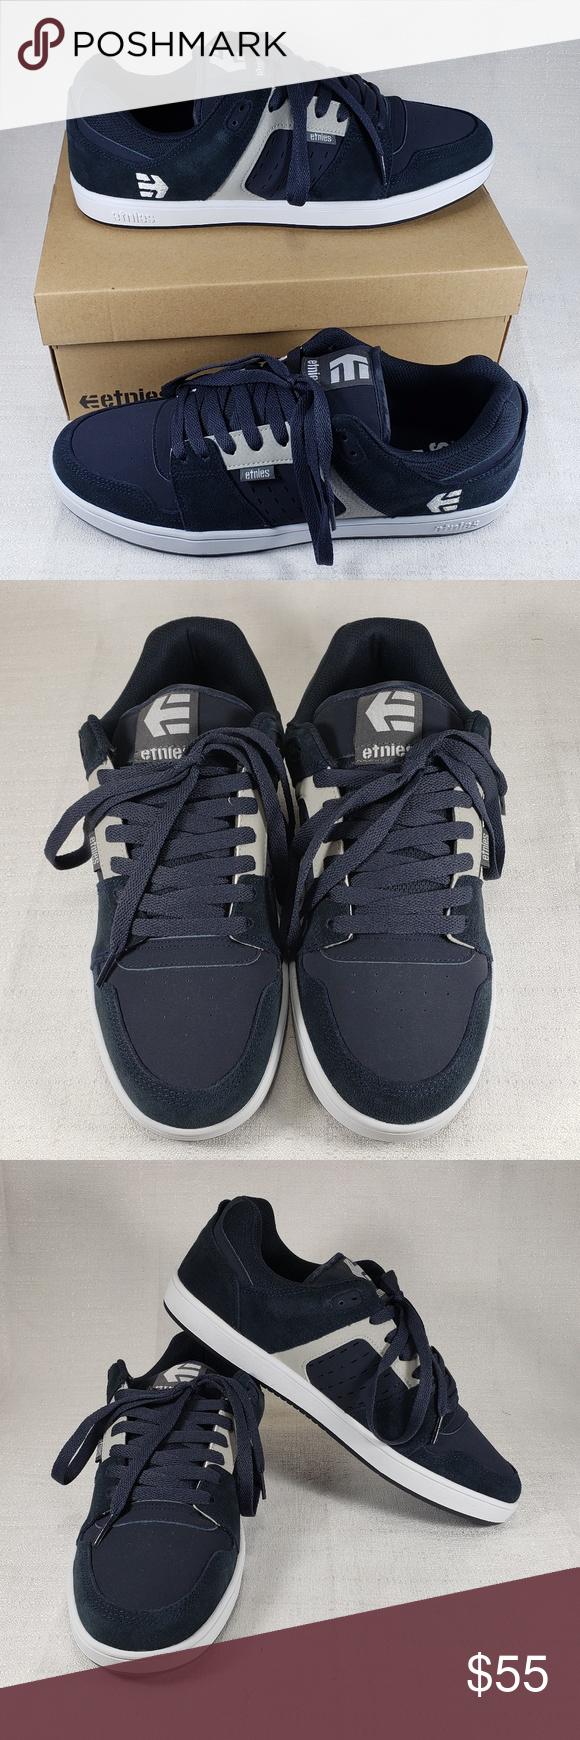 Rockfield Skate Shoes Sneakers